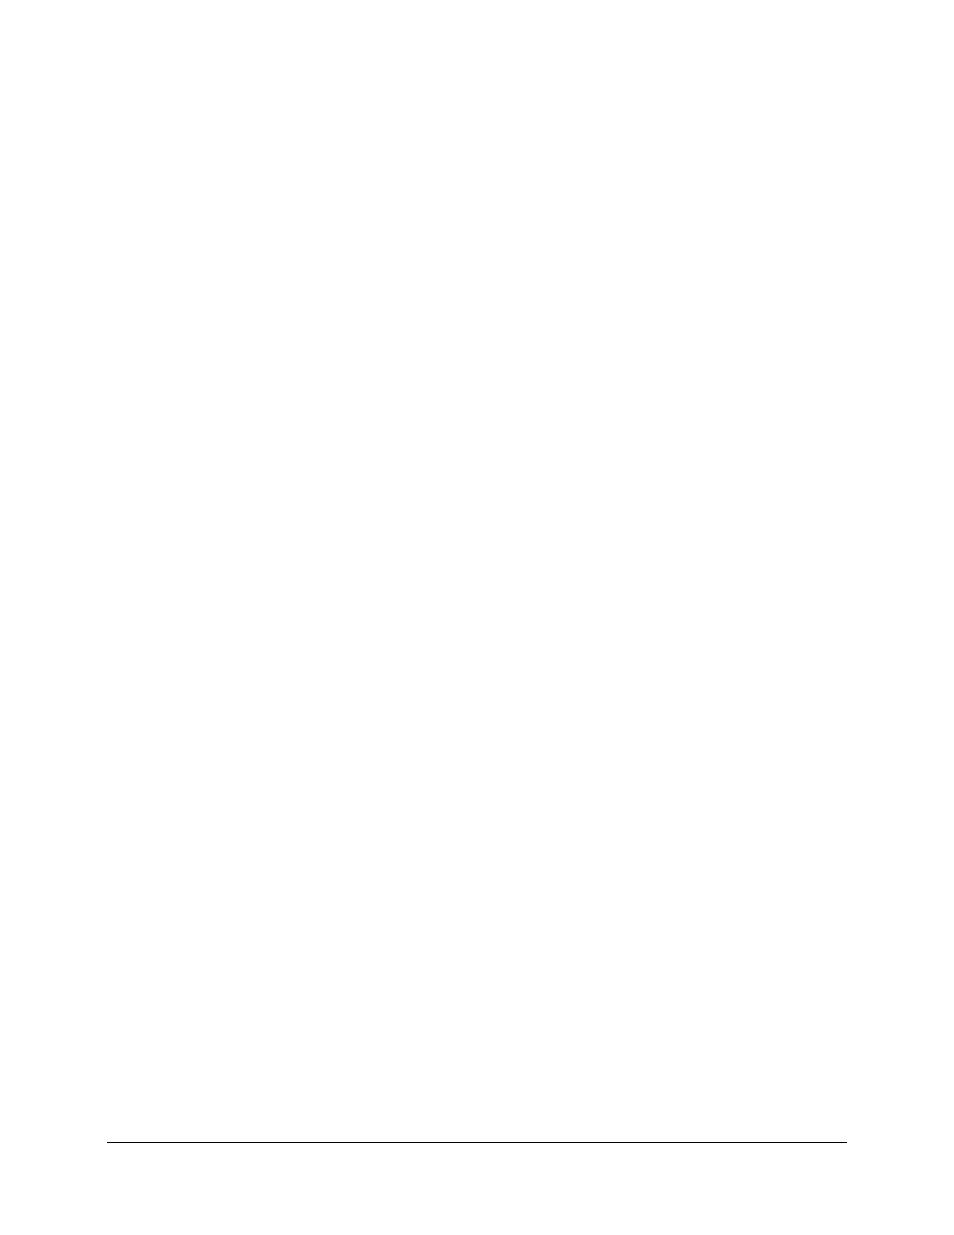 Mechanical installation considerations, Rfi/emi